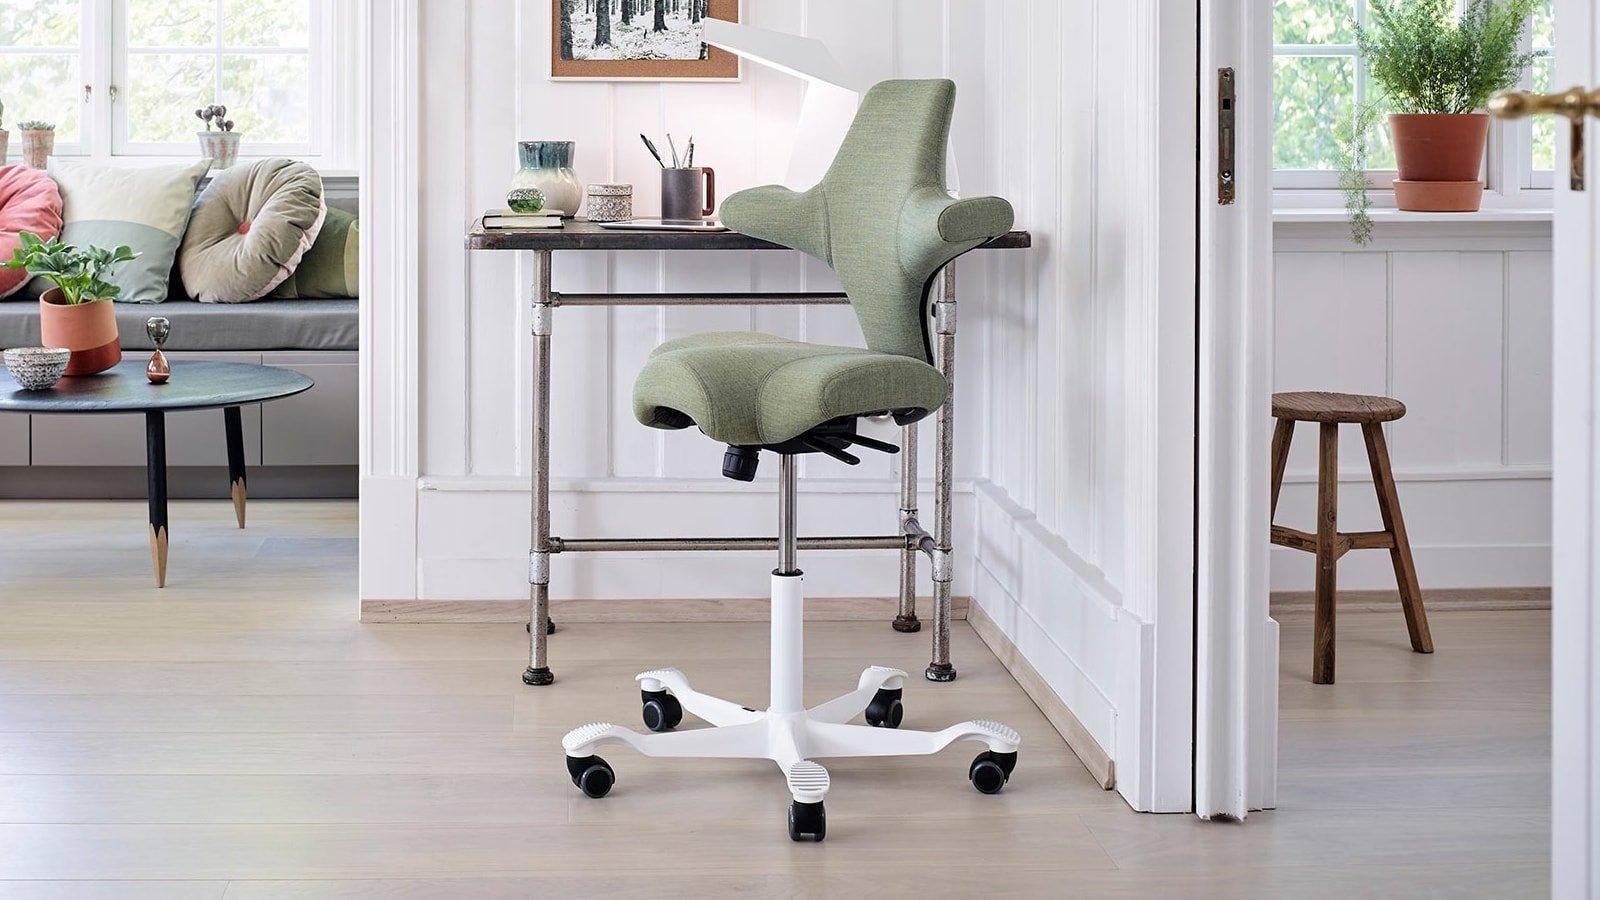 HÅG Capisco Chair ergonomic office seat provides multiple active sitting options